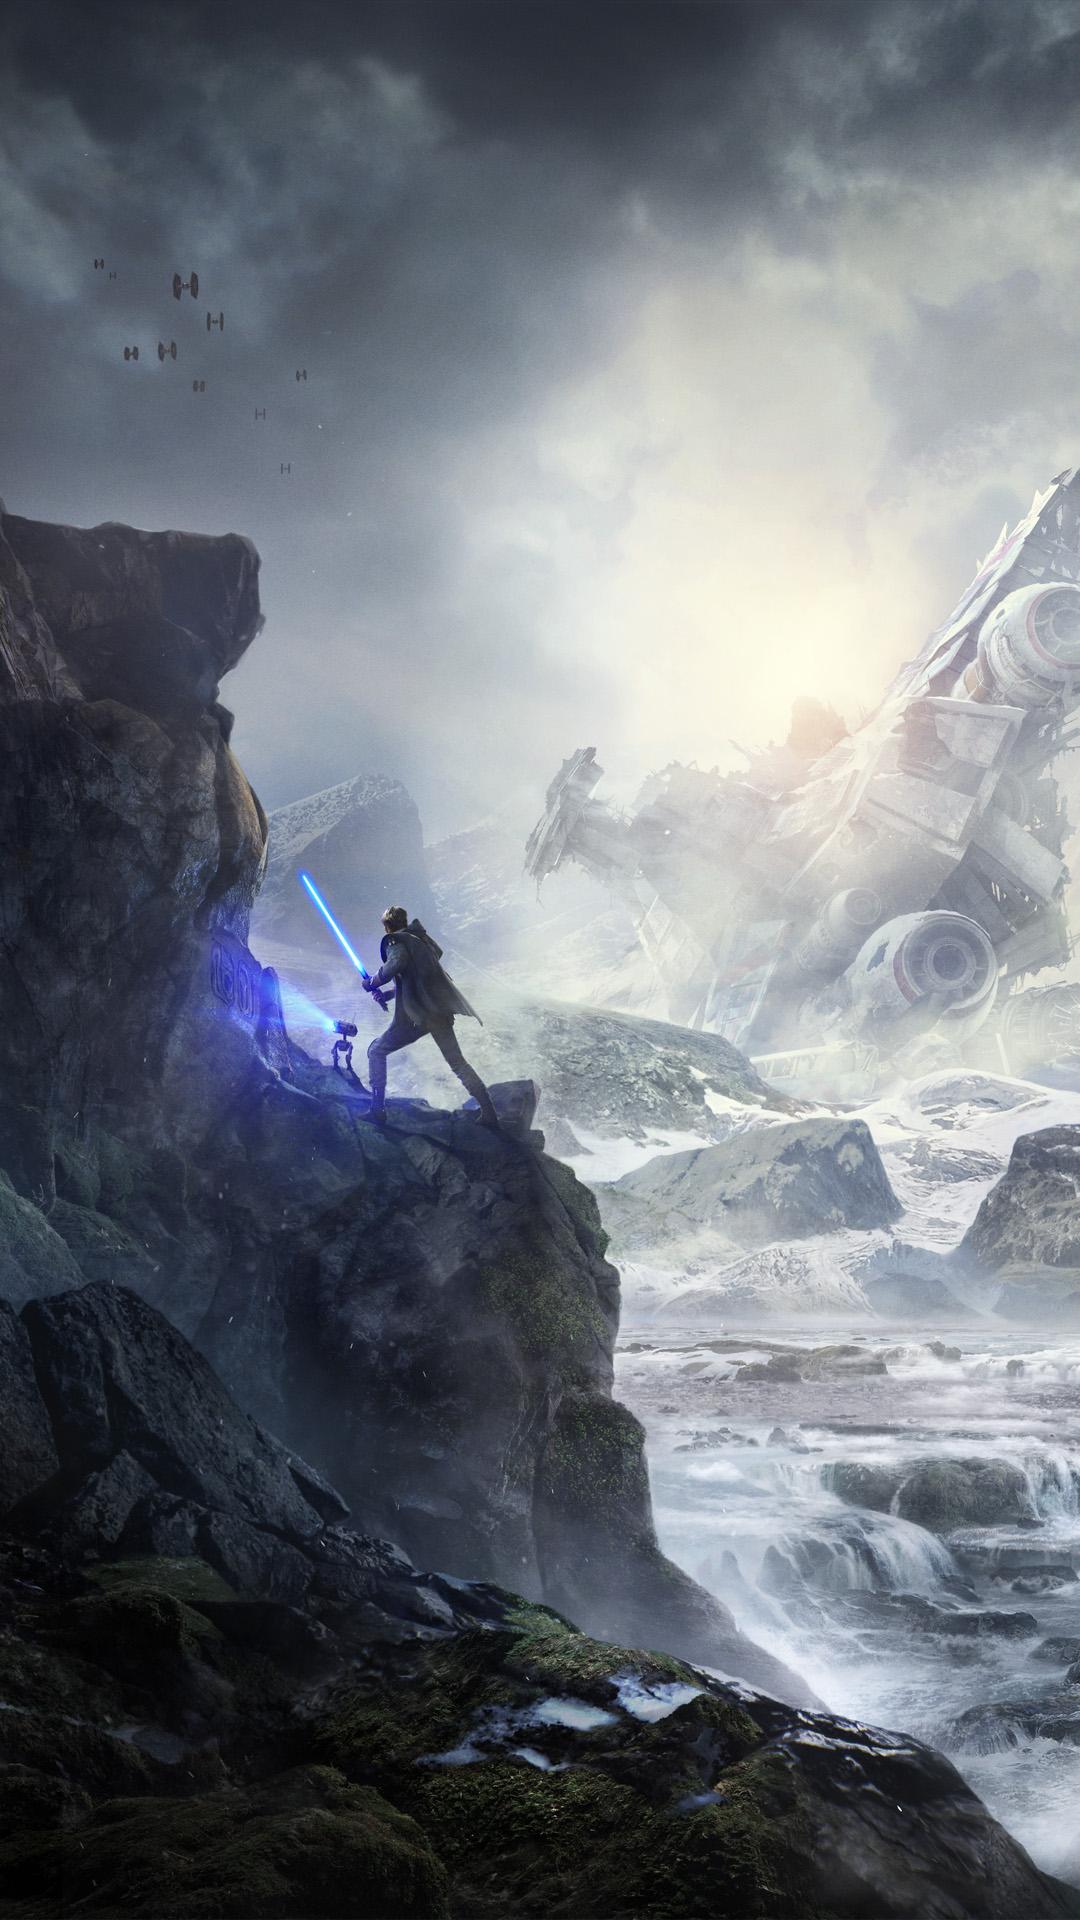 Star Wars Jedi Fallen Order Posters 1080x1920 Download Hd Wallpaper Wallpapertip